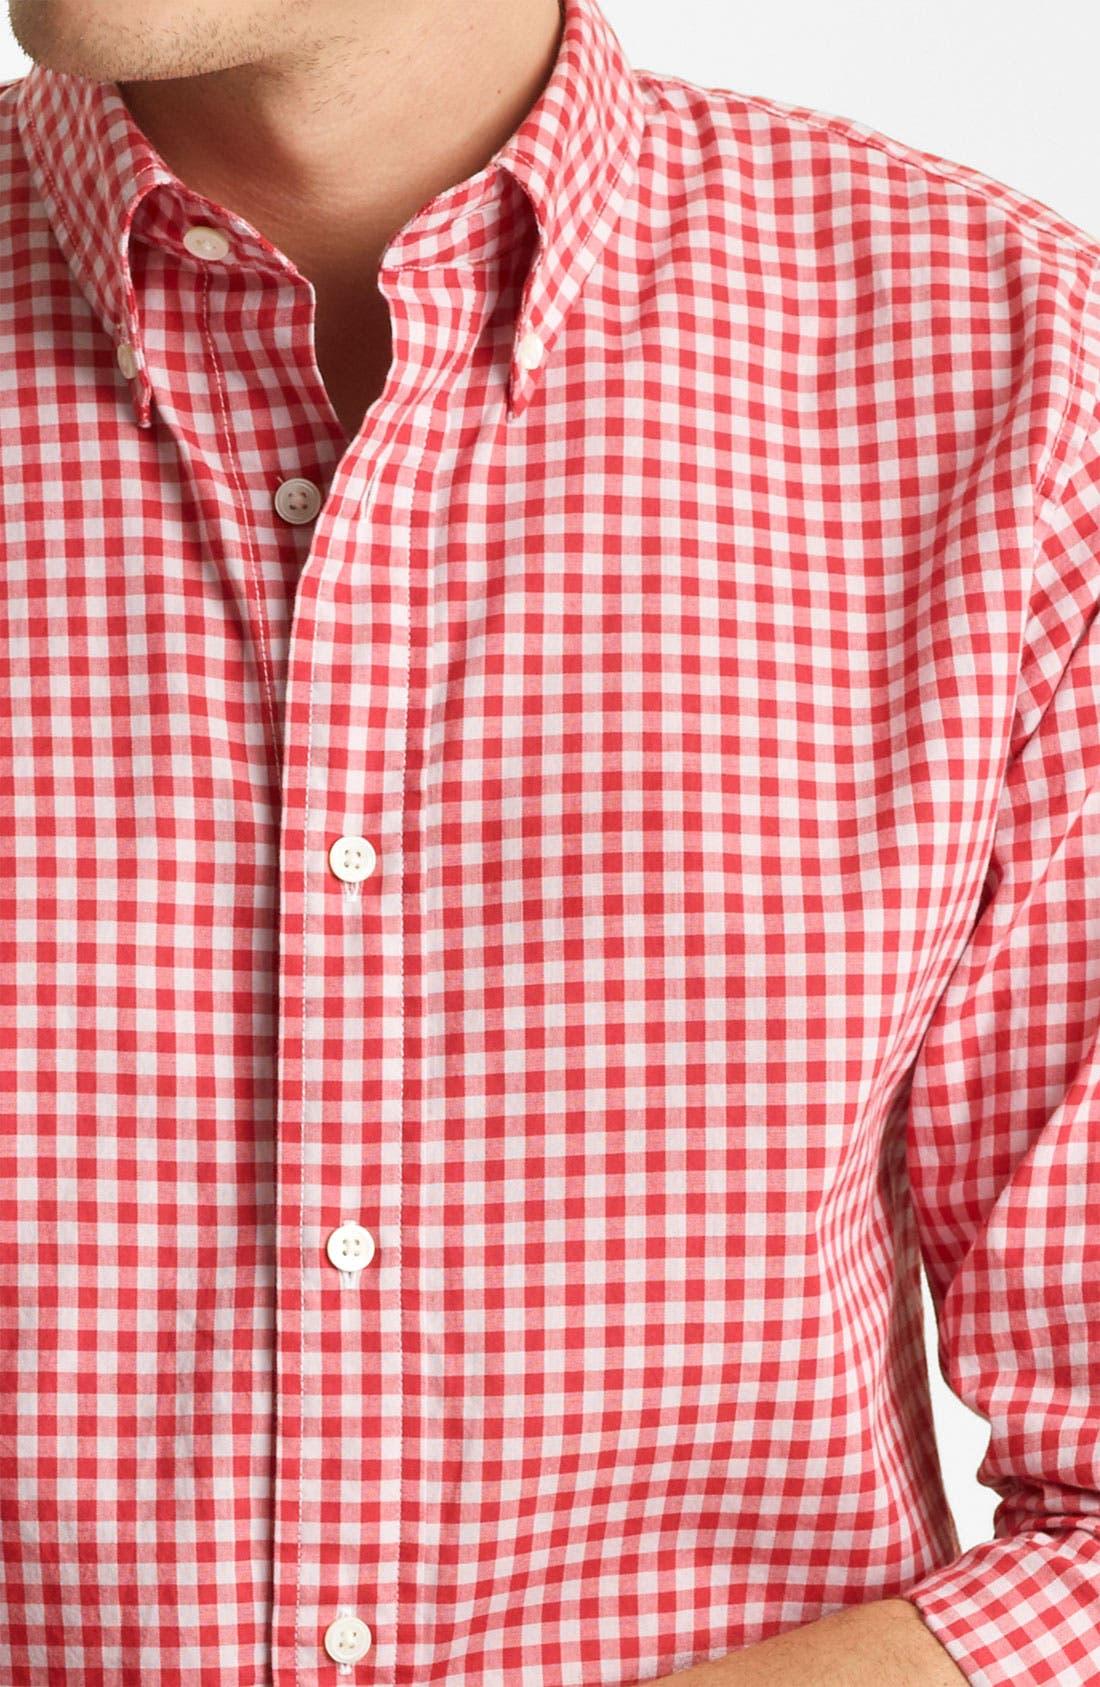 Alternate Image 3  - Jack Spade 'Kern' Gingham Sport Shirt